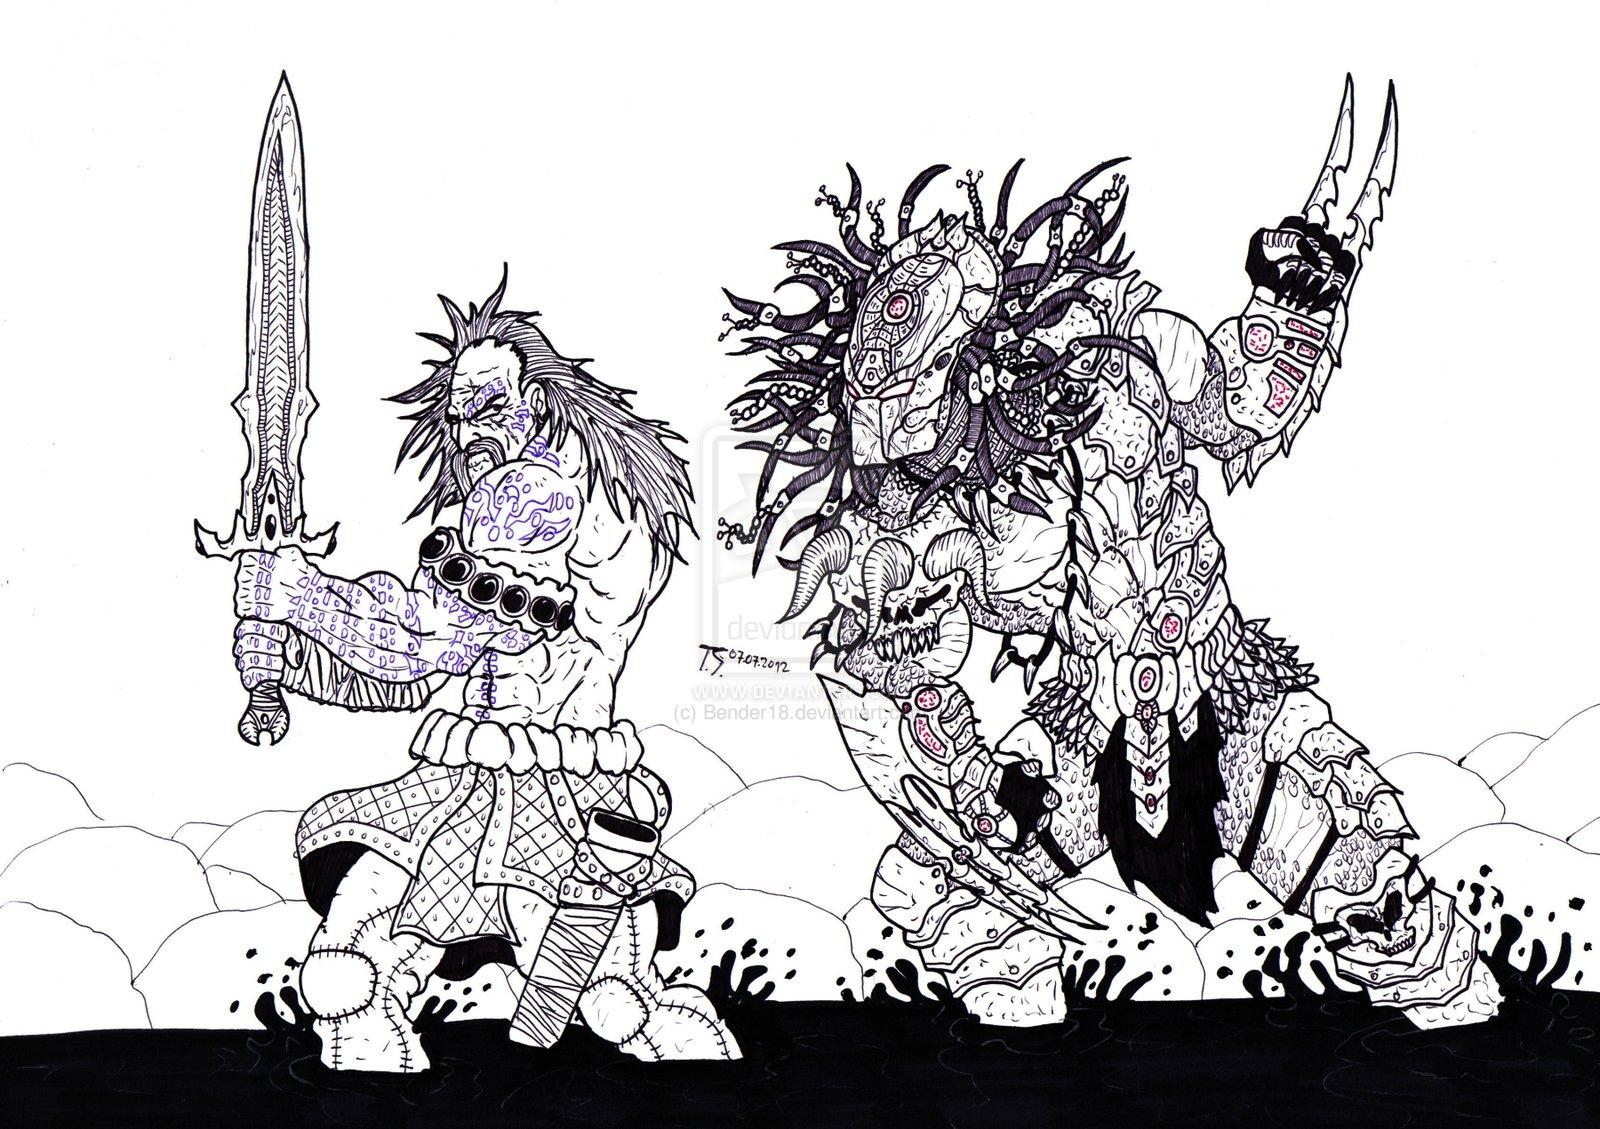 Drawn predator prometheus Artworks  Bender1988